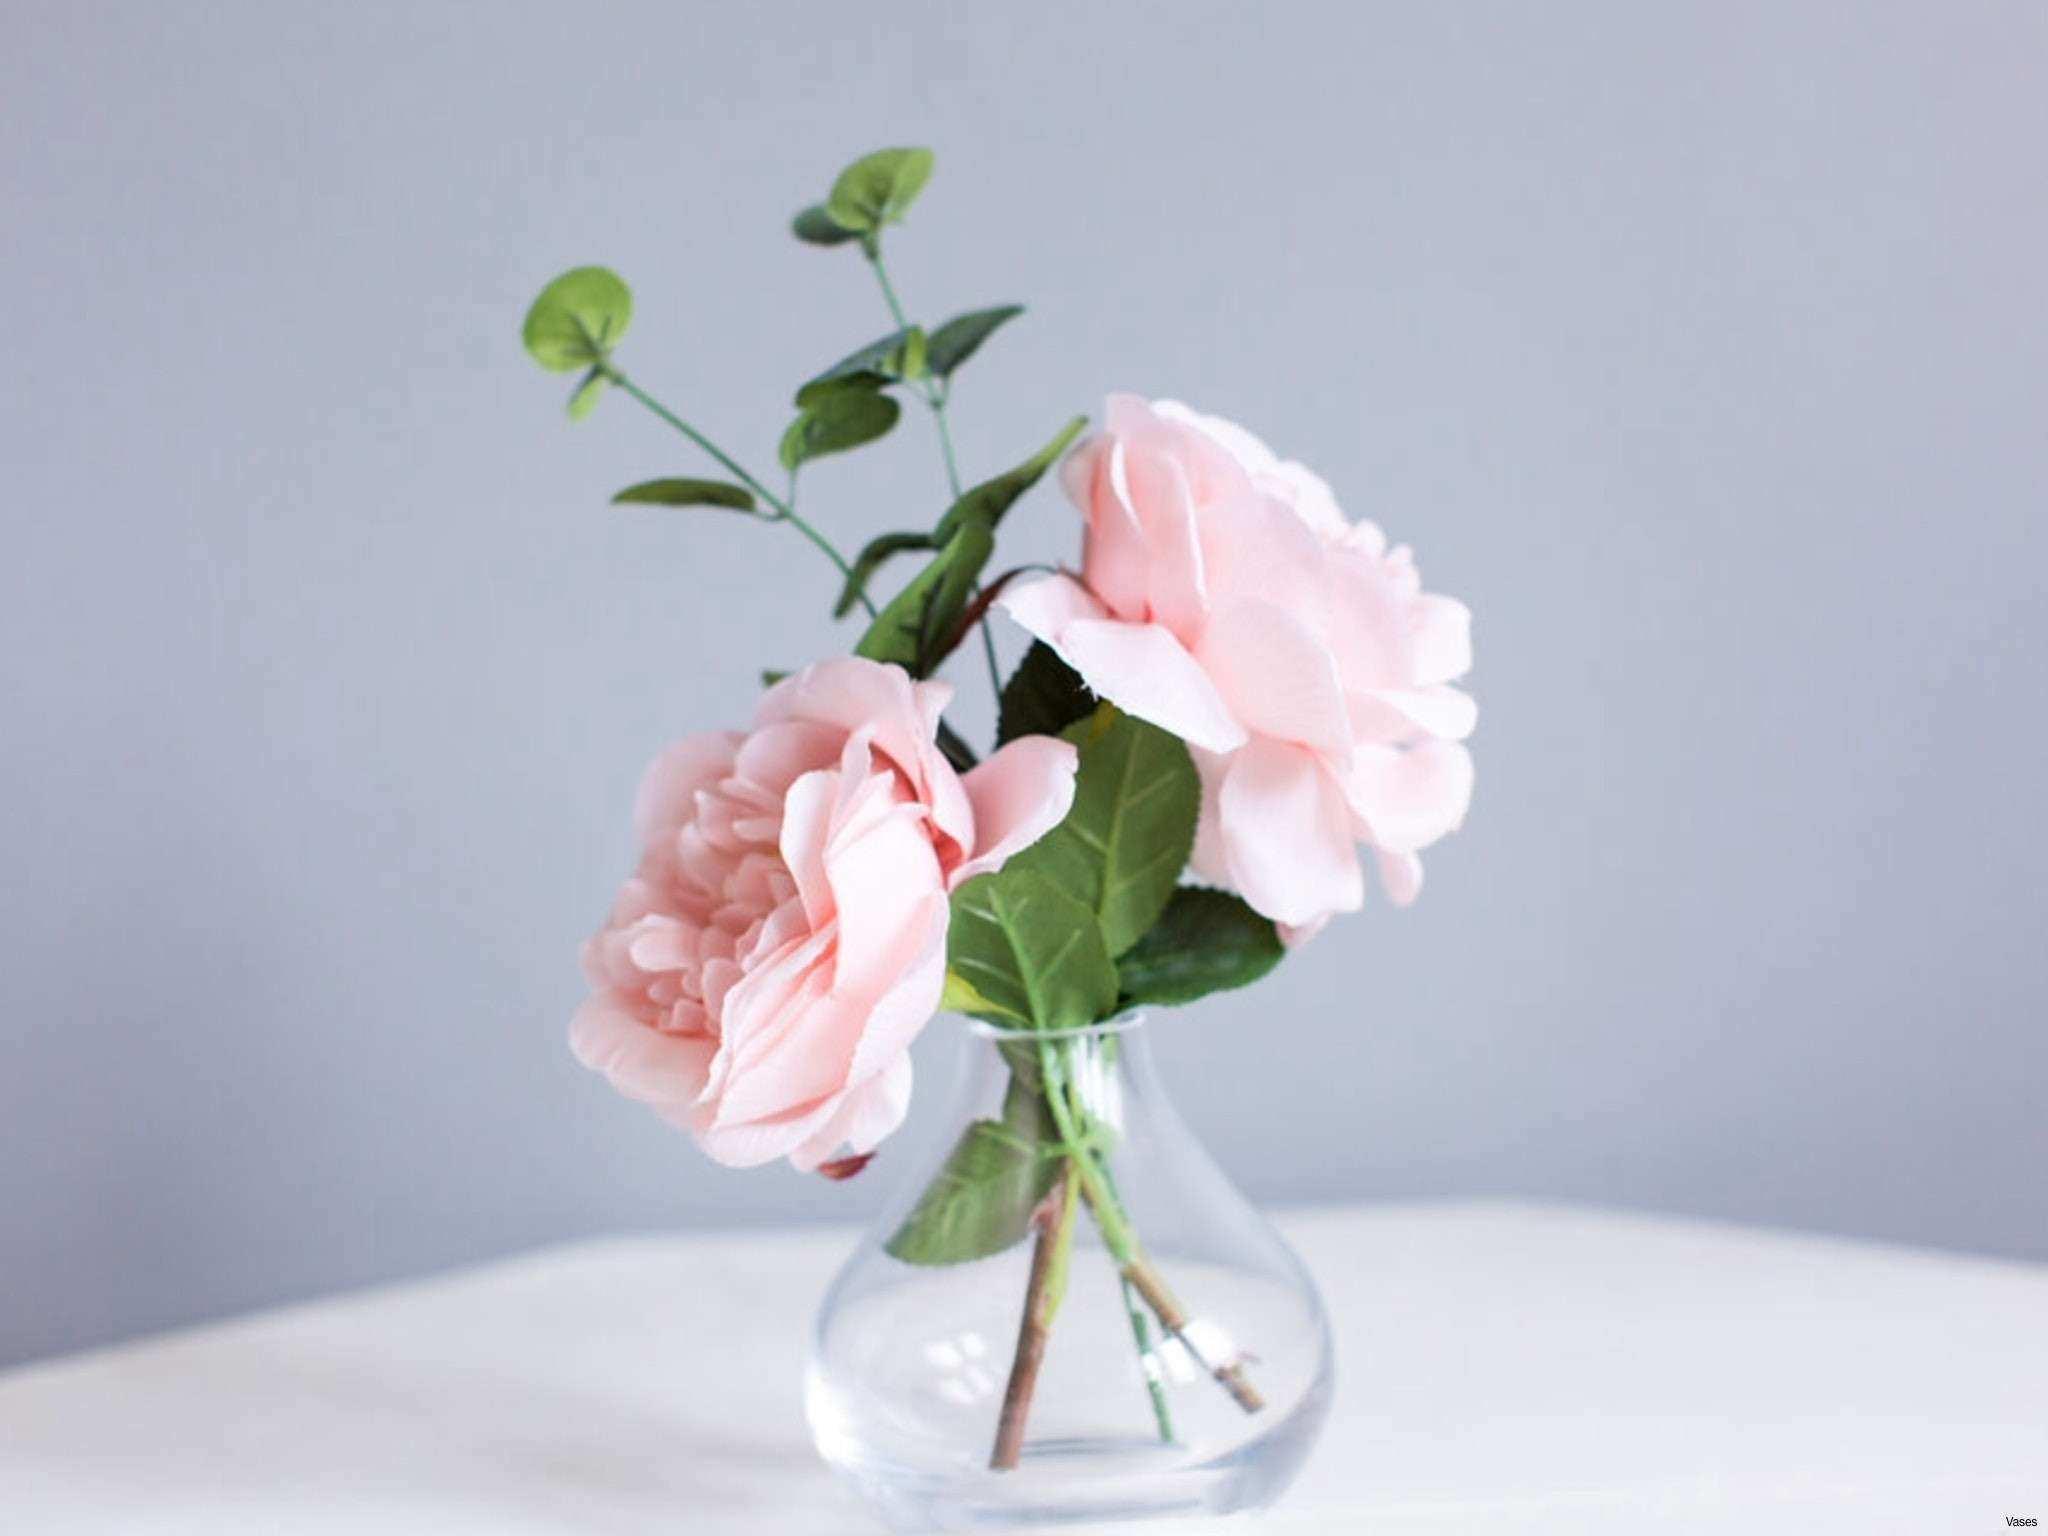 wall vase ideas of flower garden decorations elegant h vases bud vase flower pertaining to flower garden decorations elegant h vases bud vase flower arrangements i 0d for inspiration design